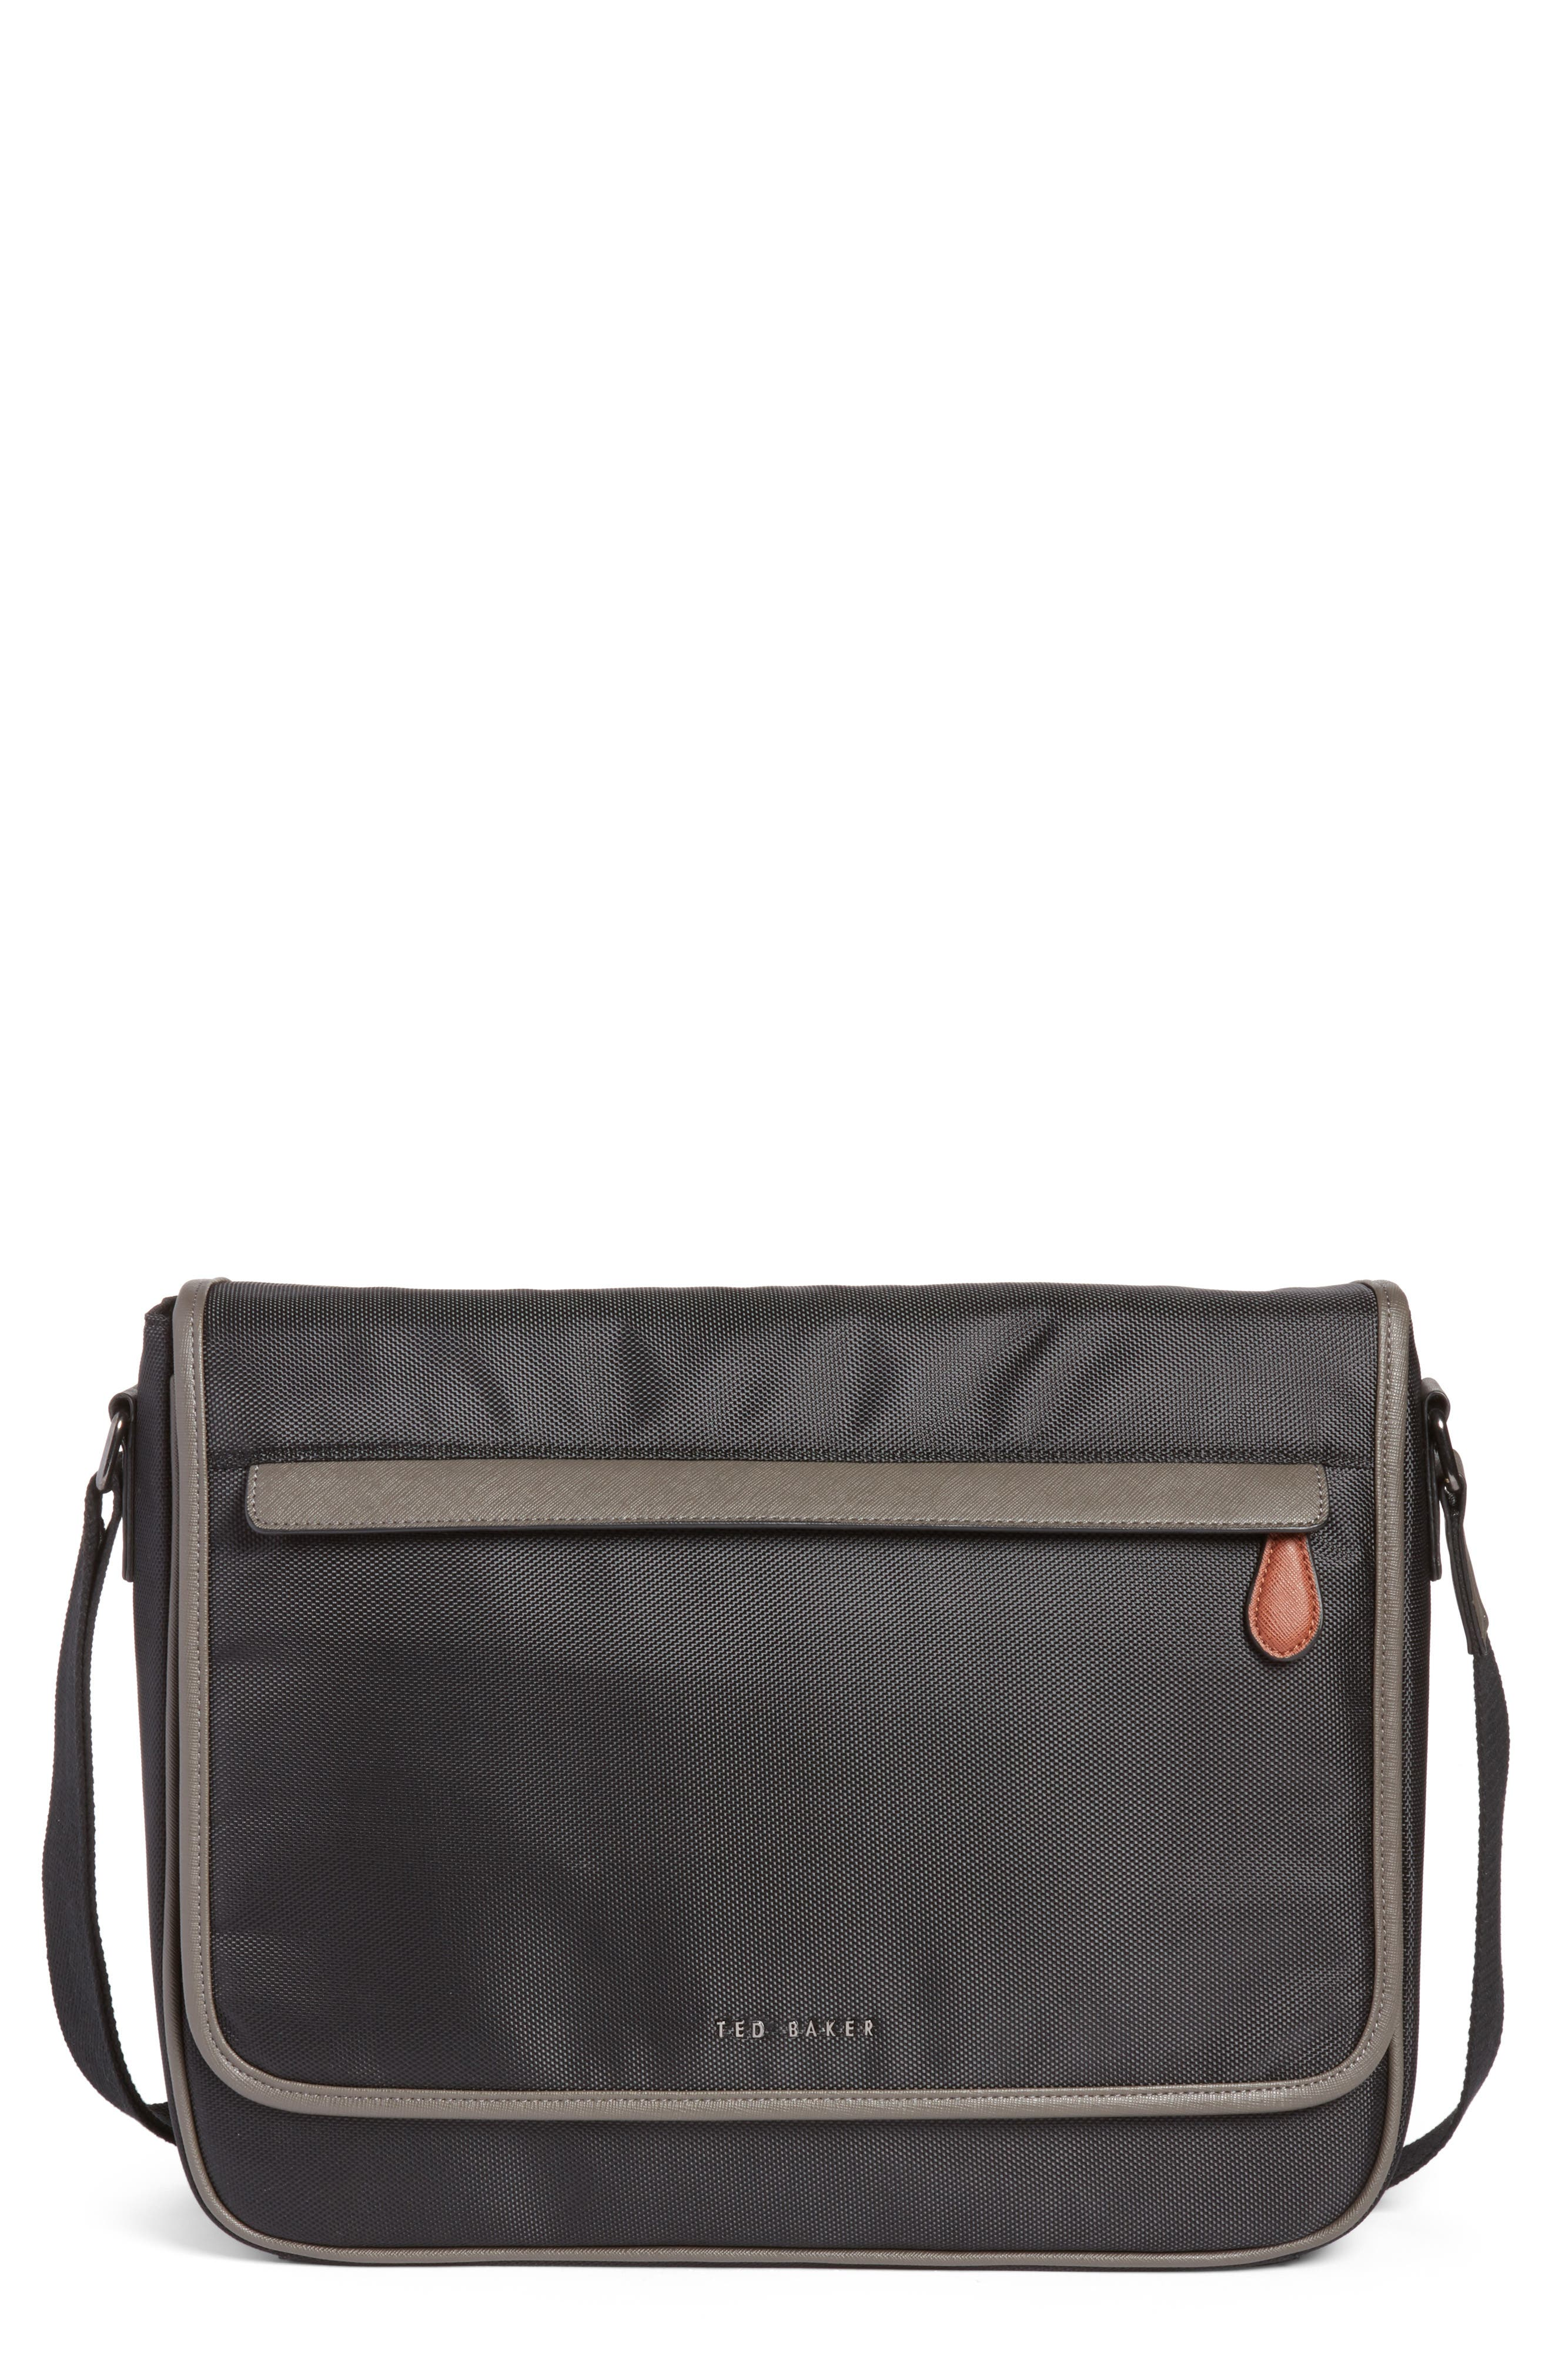 Ted Baker London Wisker Messenger Bag